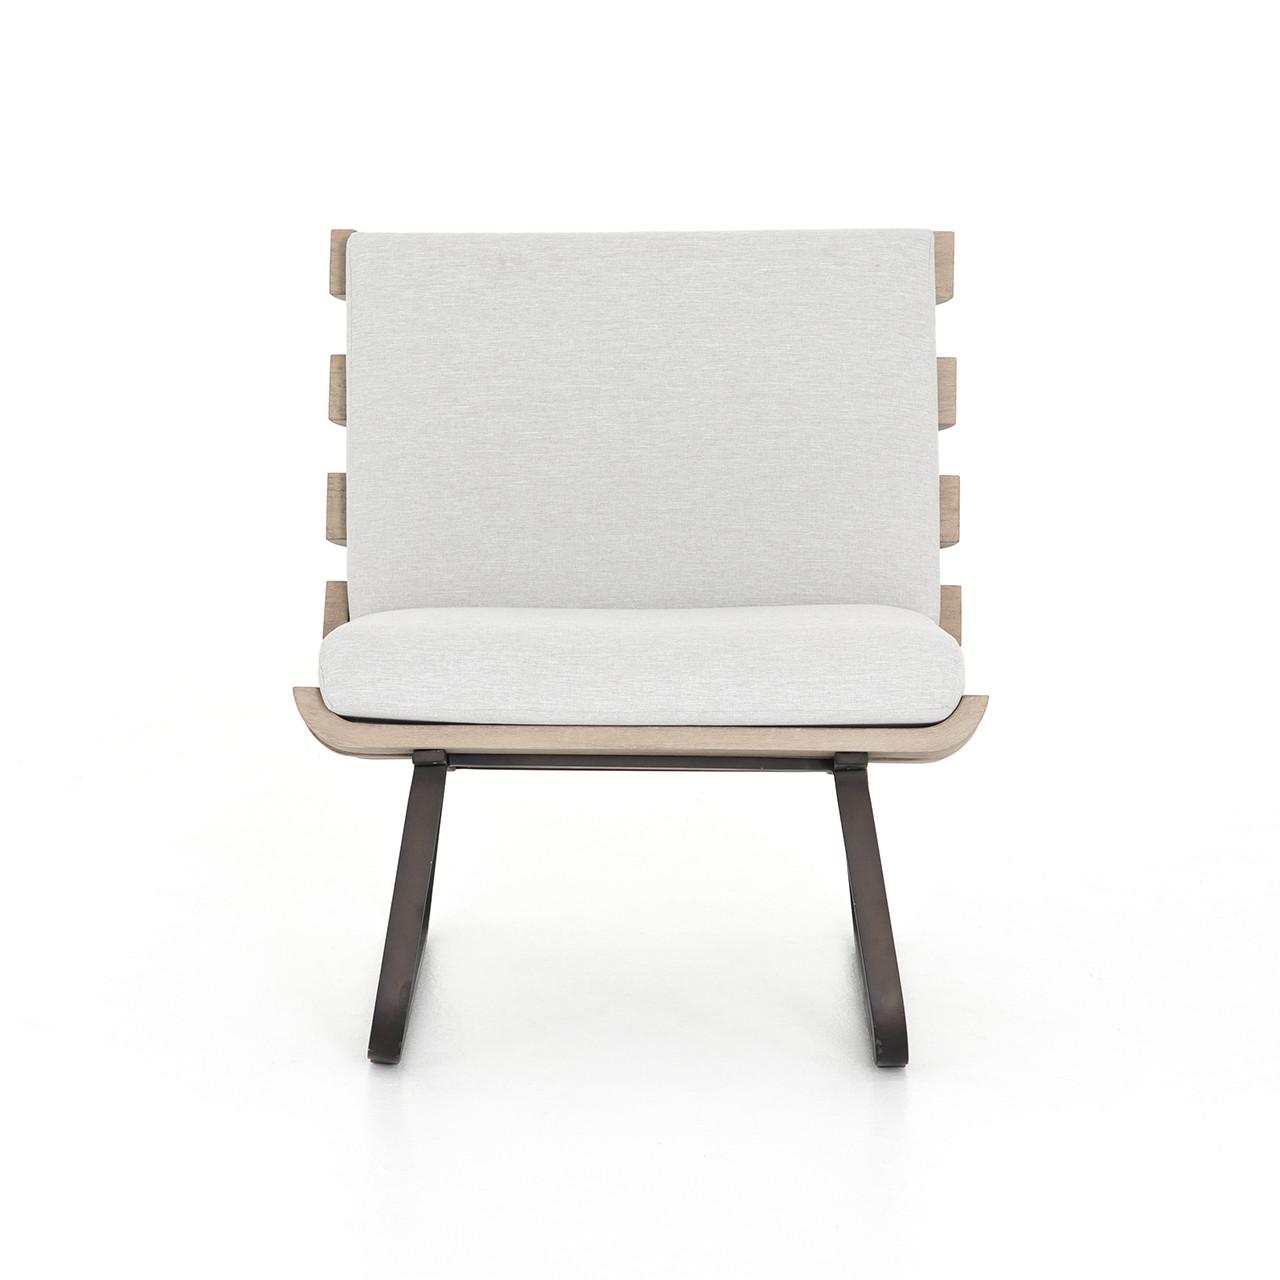 Laguna Outdoor Chair - Stone Grey